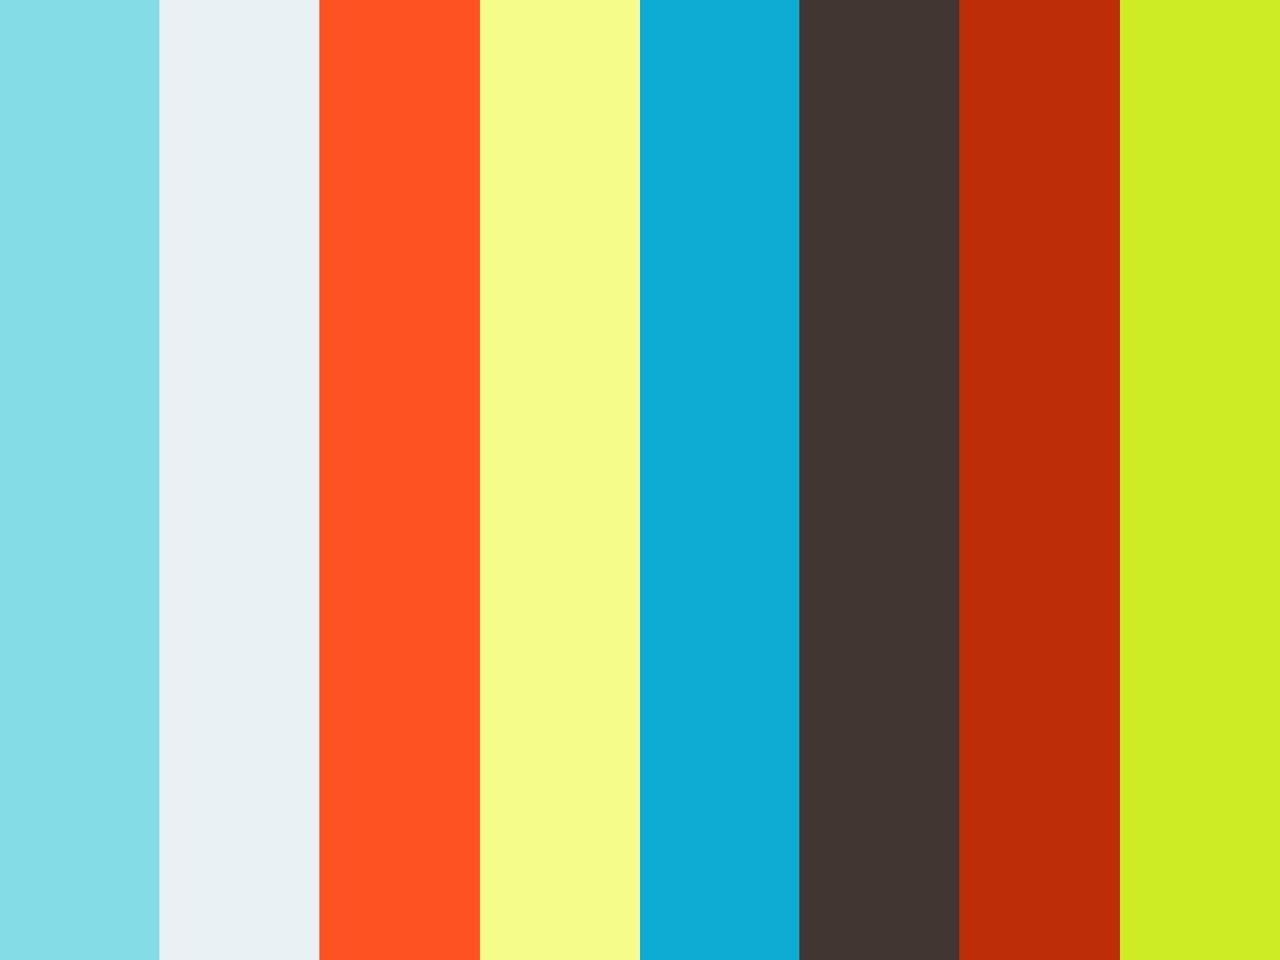 Seyit Ares - Kinefinity Mavo LF Anamorphic